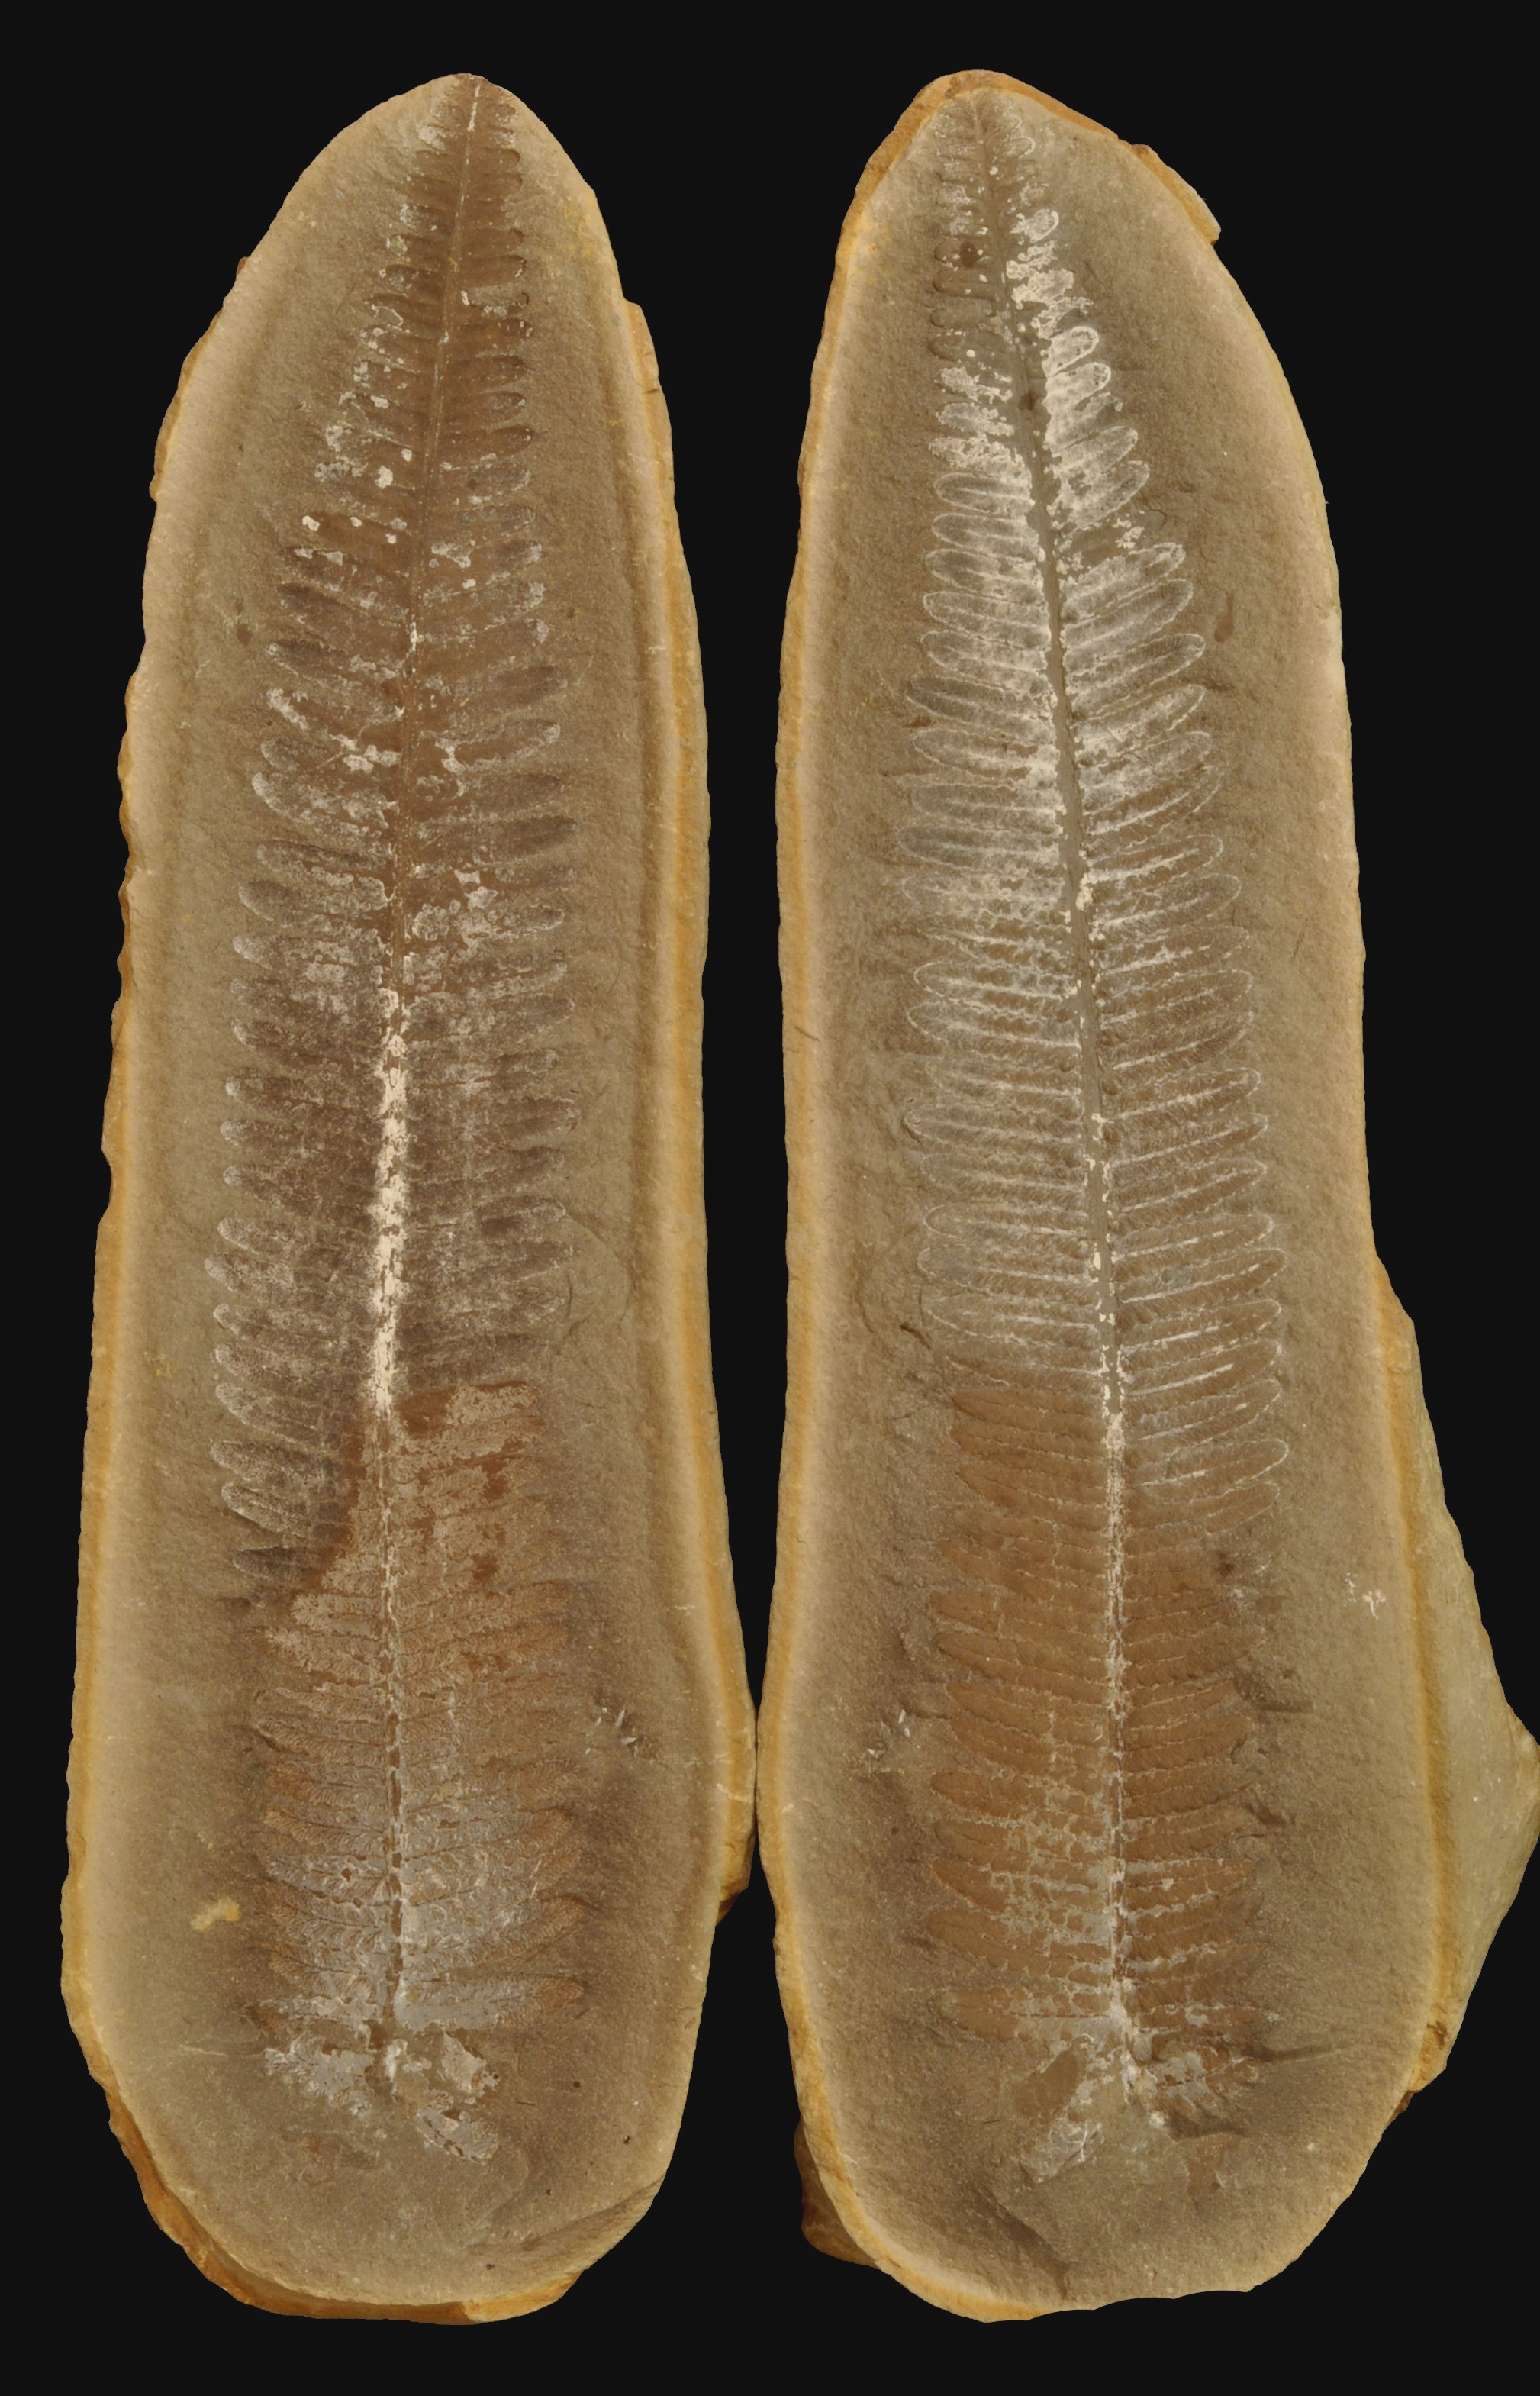 Lobatopteris